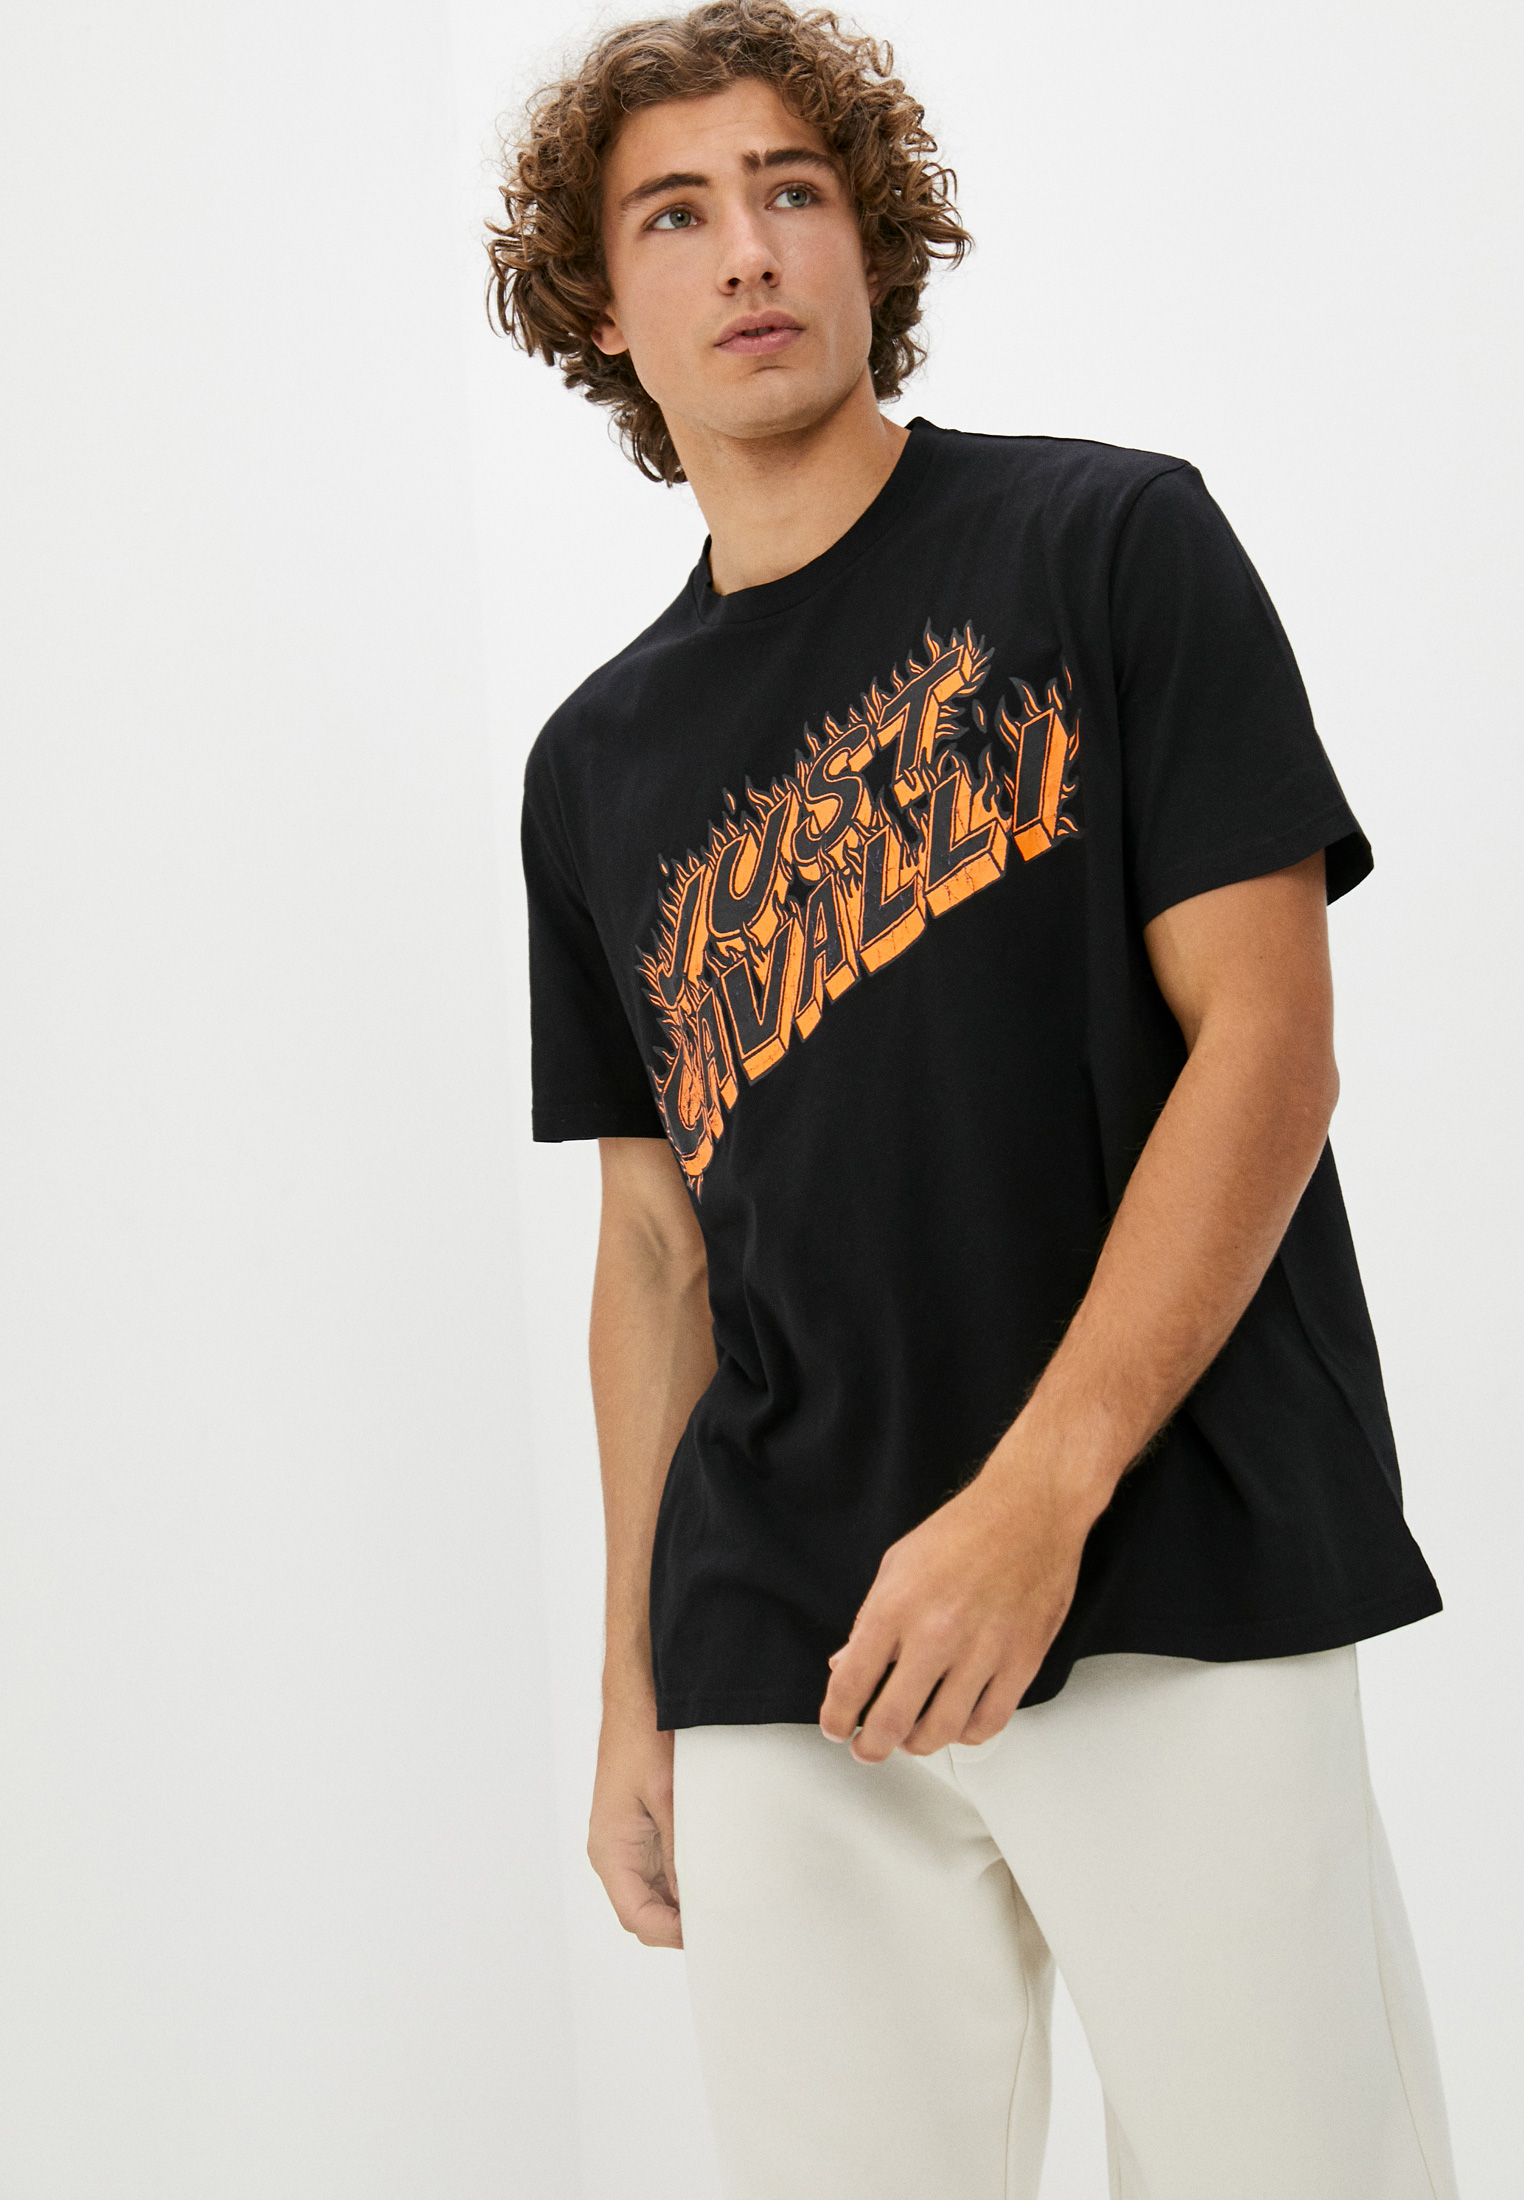 Мужская футболка Just Cavalli (Джаст Кавалли) S03GC0630N20663